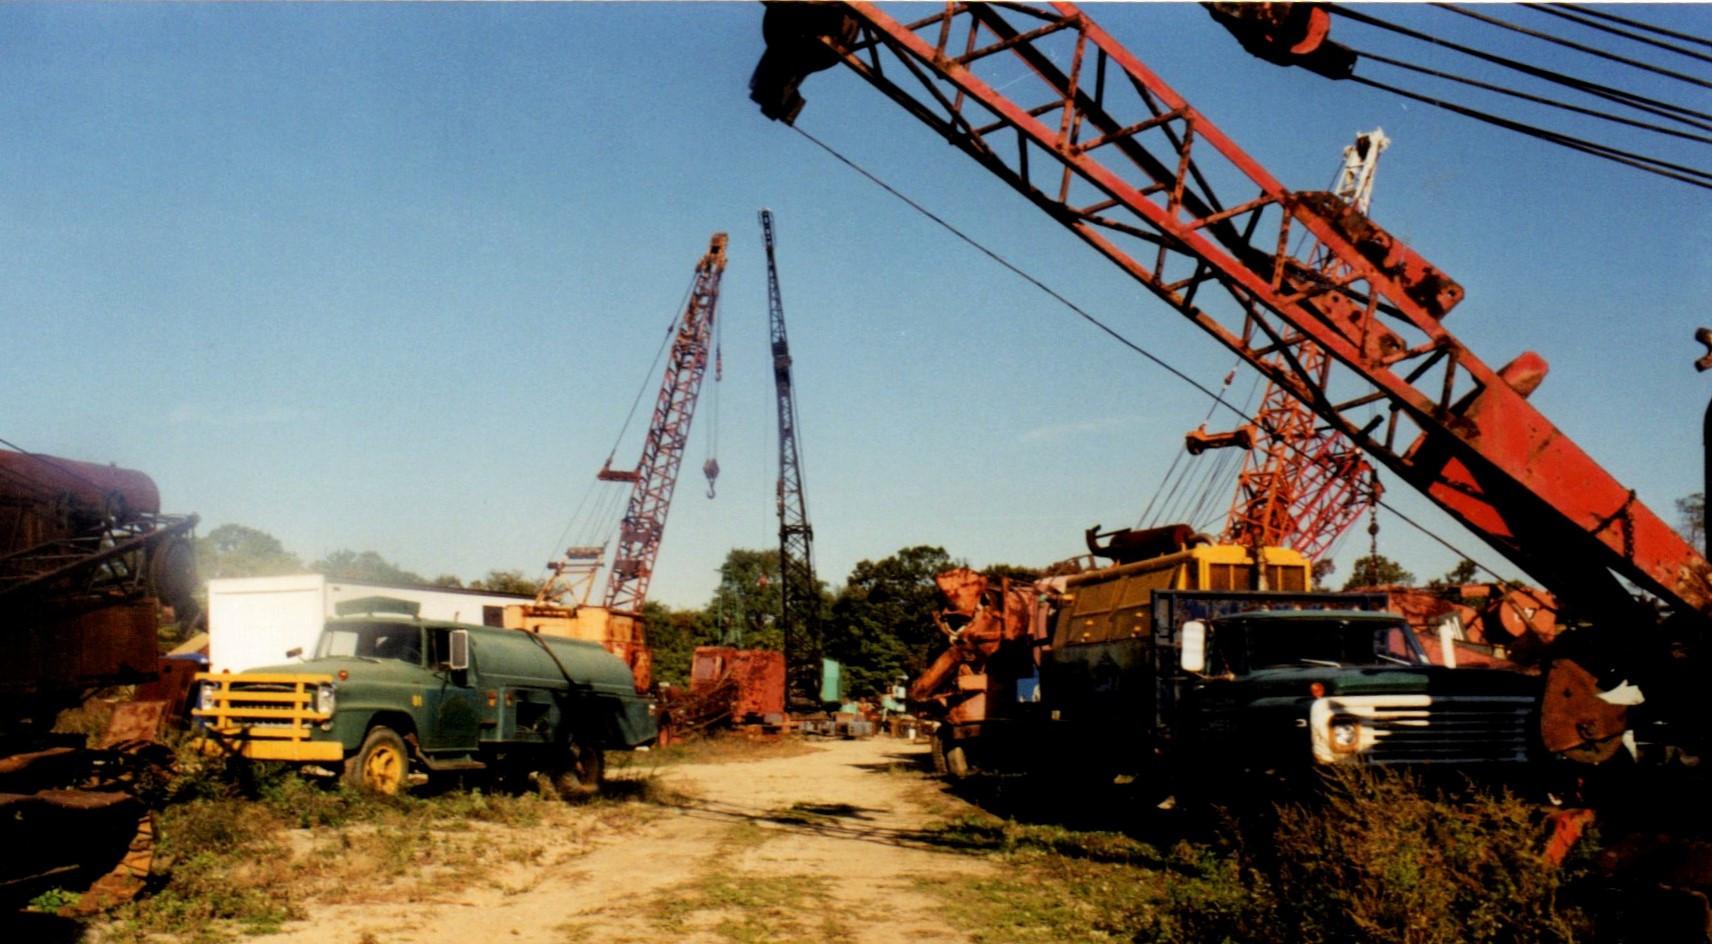 Old trucks & cranes